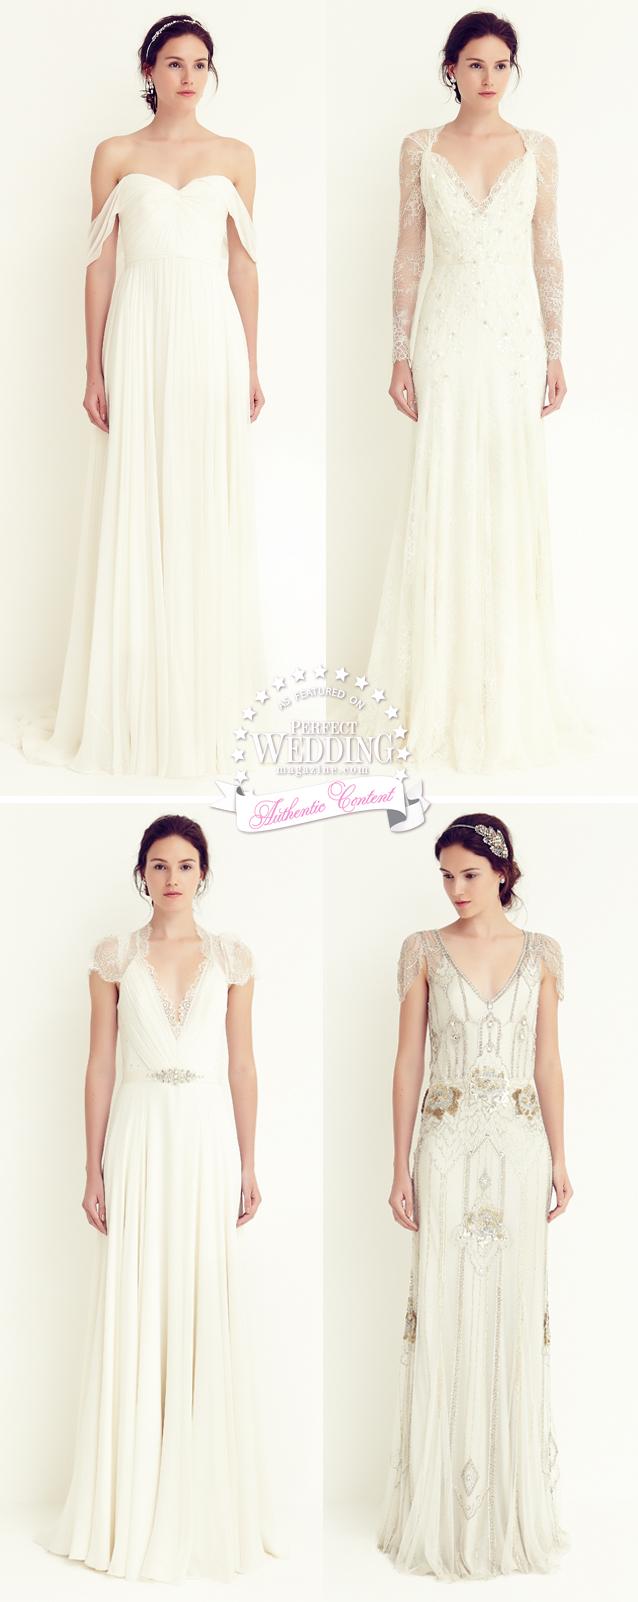 Jenny Packham, Jenny Packham Bridal, Jenny Packham Petite Collection, Perfect Wedding Magazine, Bridal Fashion